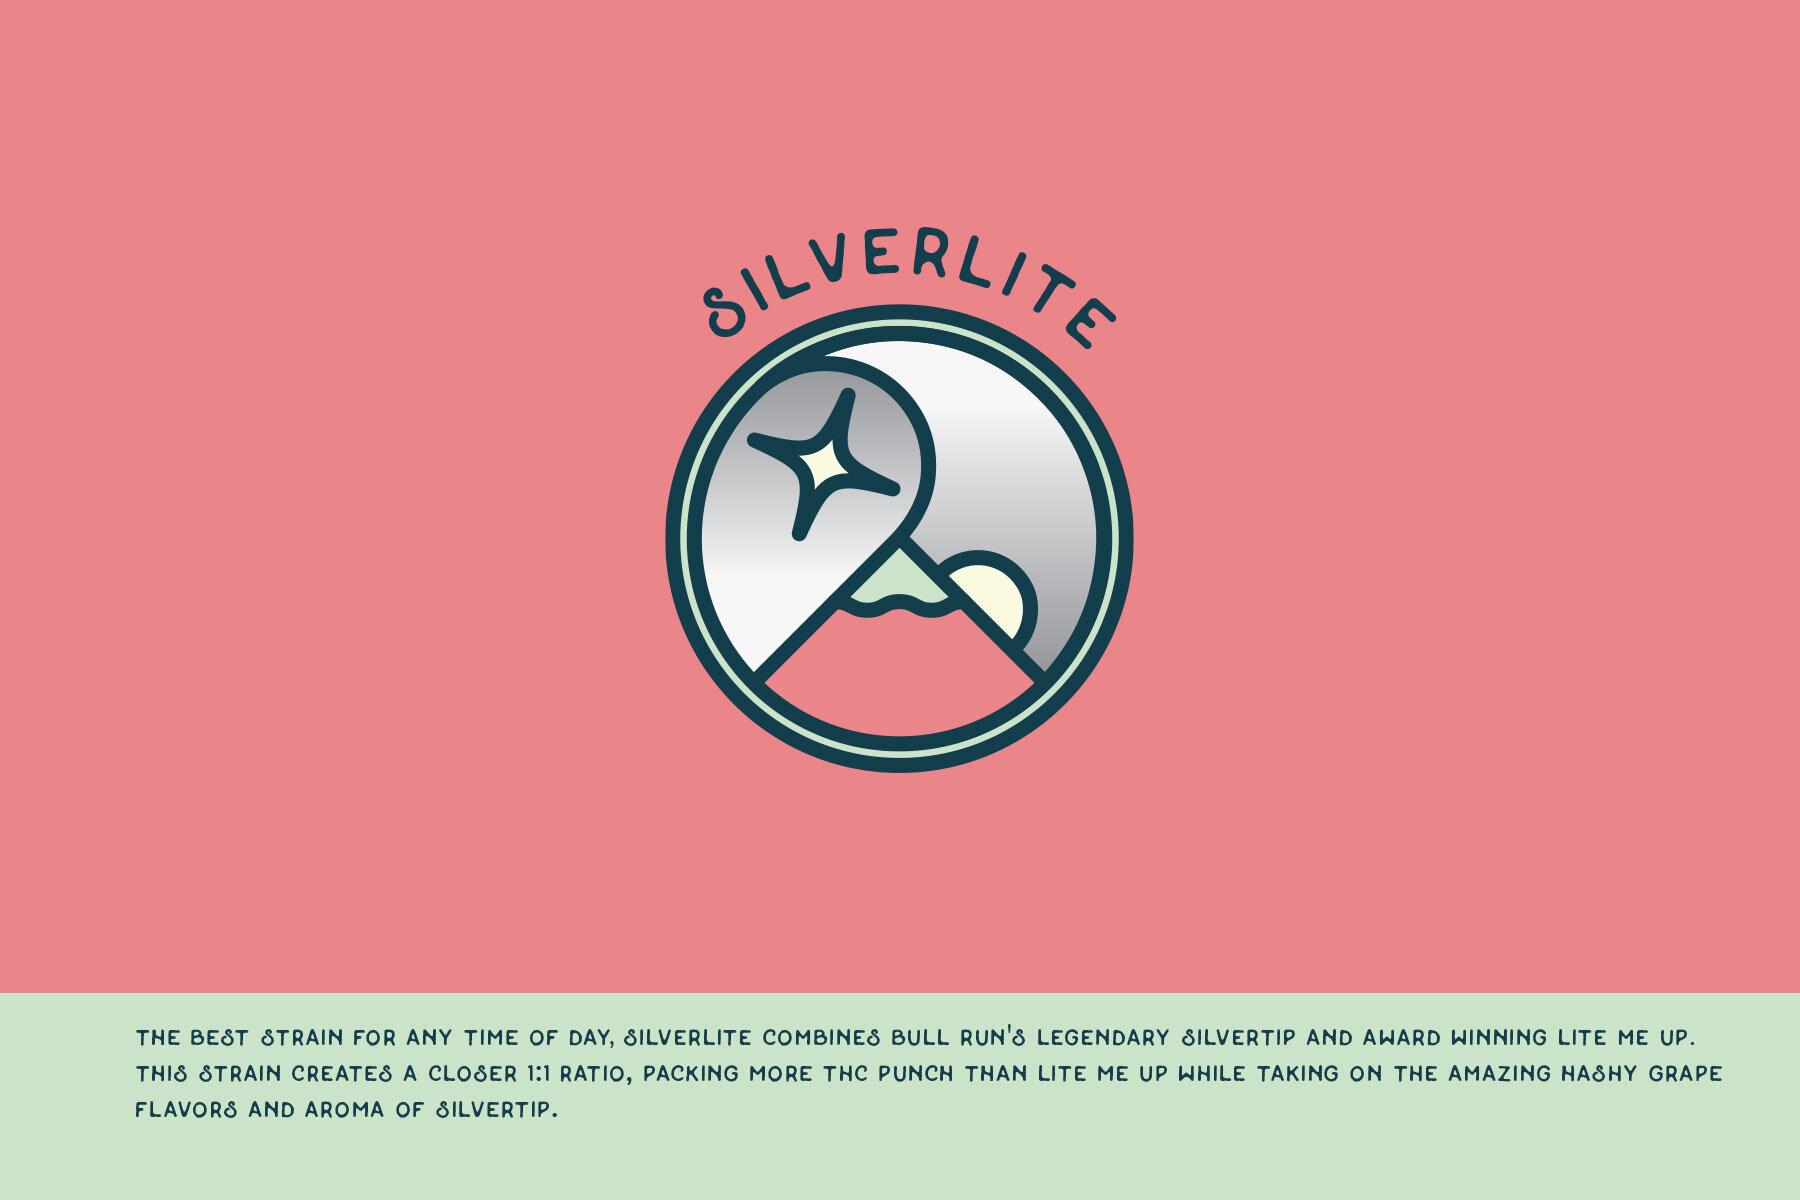 BRCC-icons-silverlite.jpg